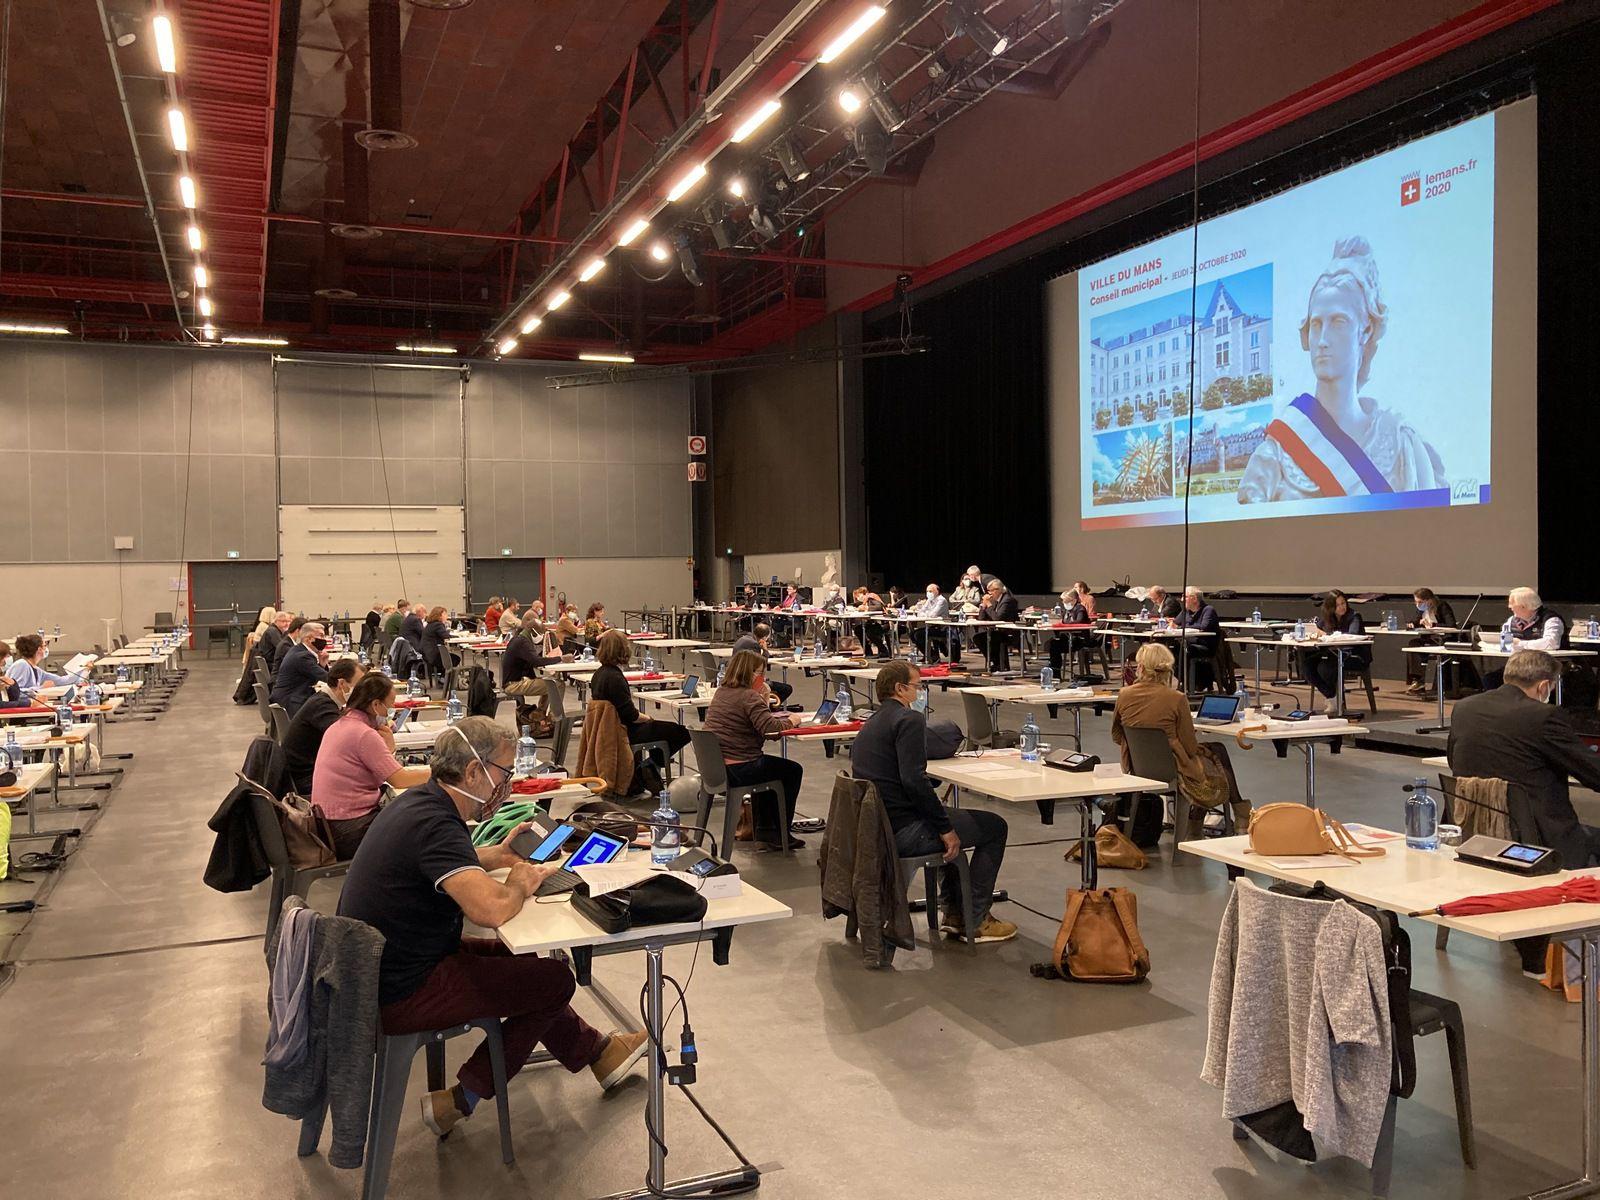 Conseil municipal du 22 octobre 2020